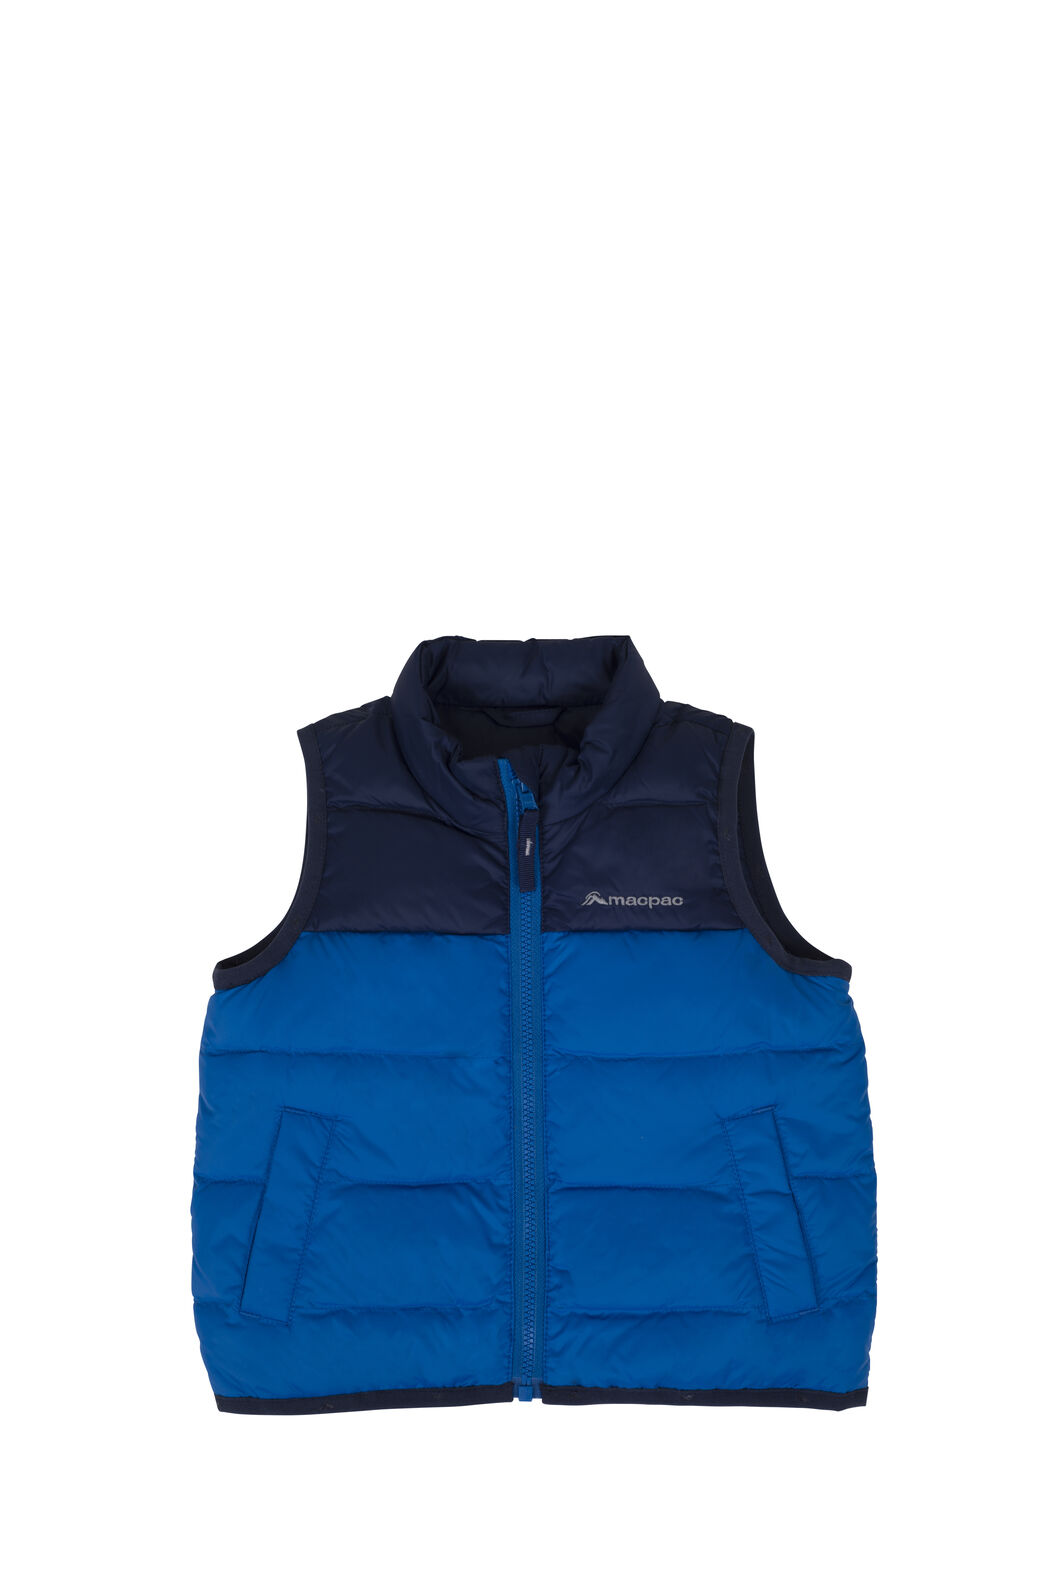 Macpac Atom Vest - Baby, Black Iris/Snorkel, hi-res